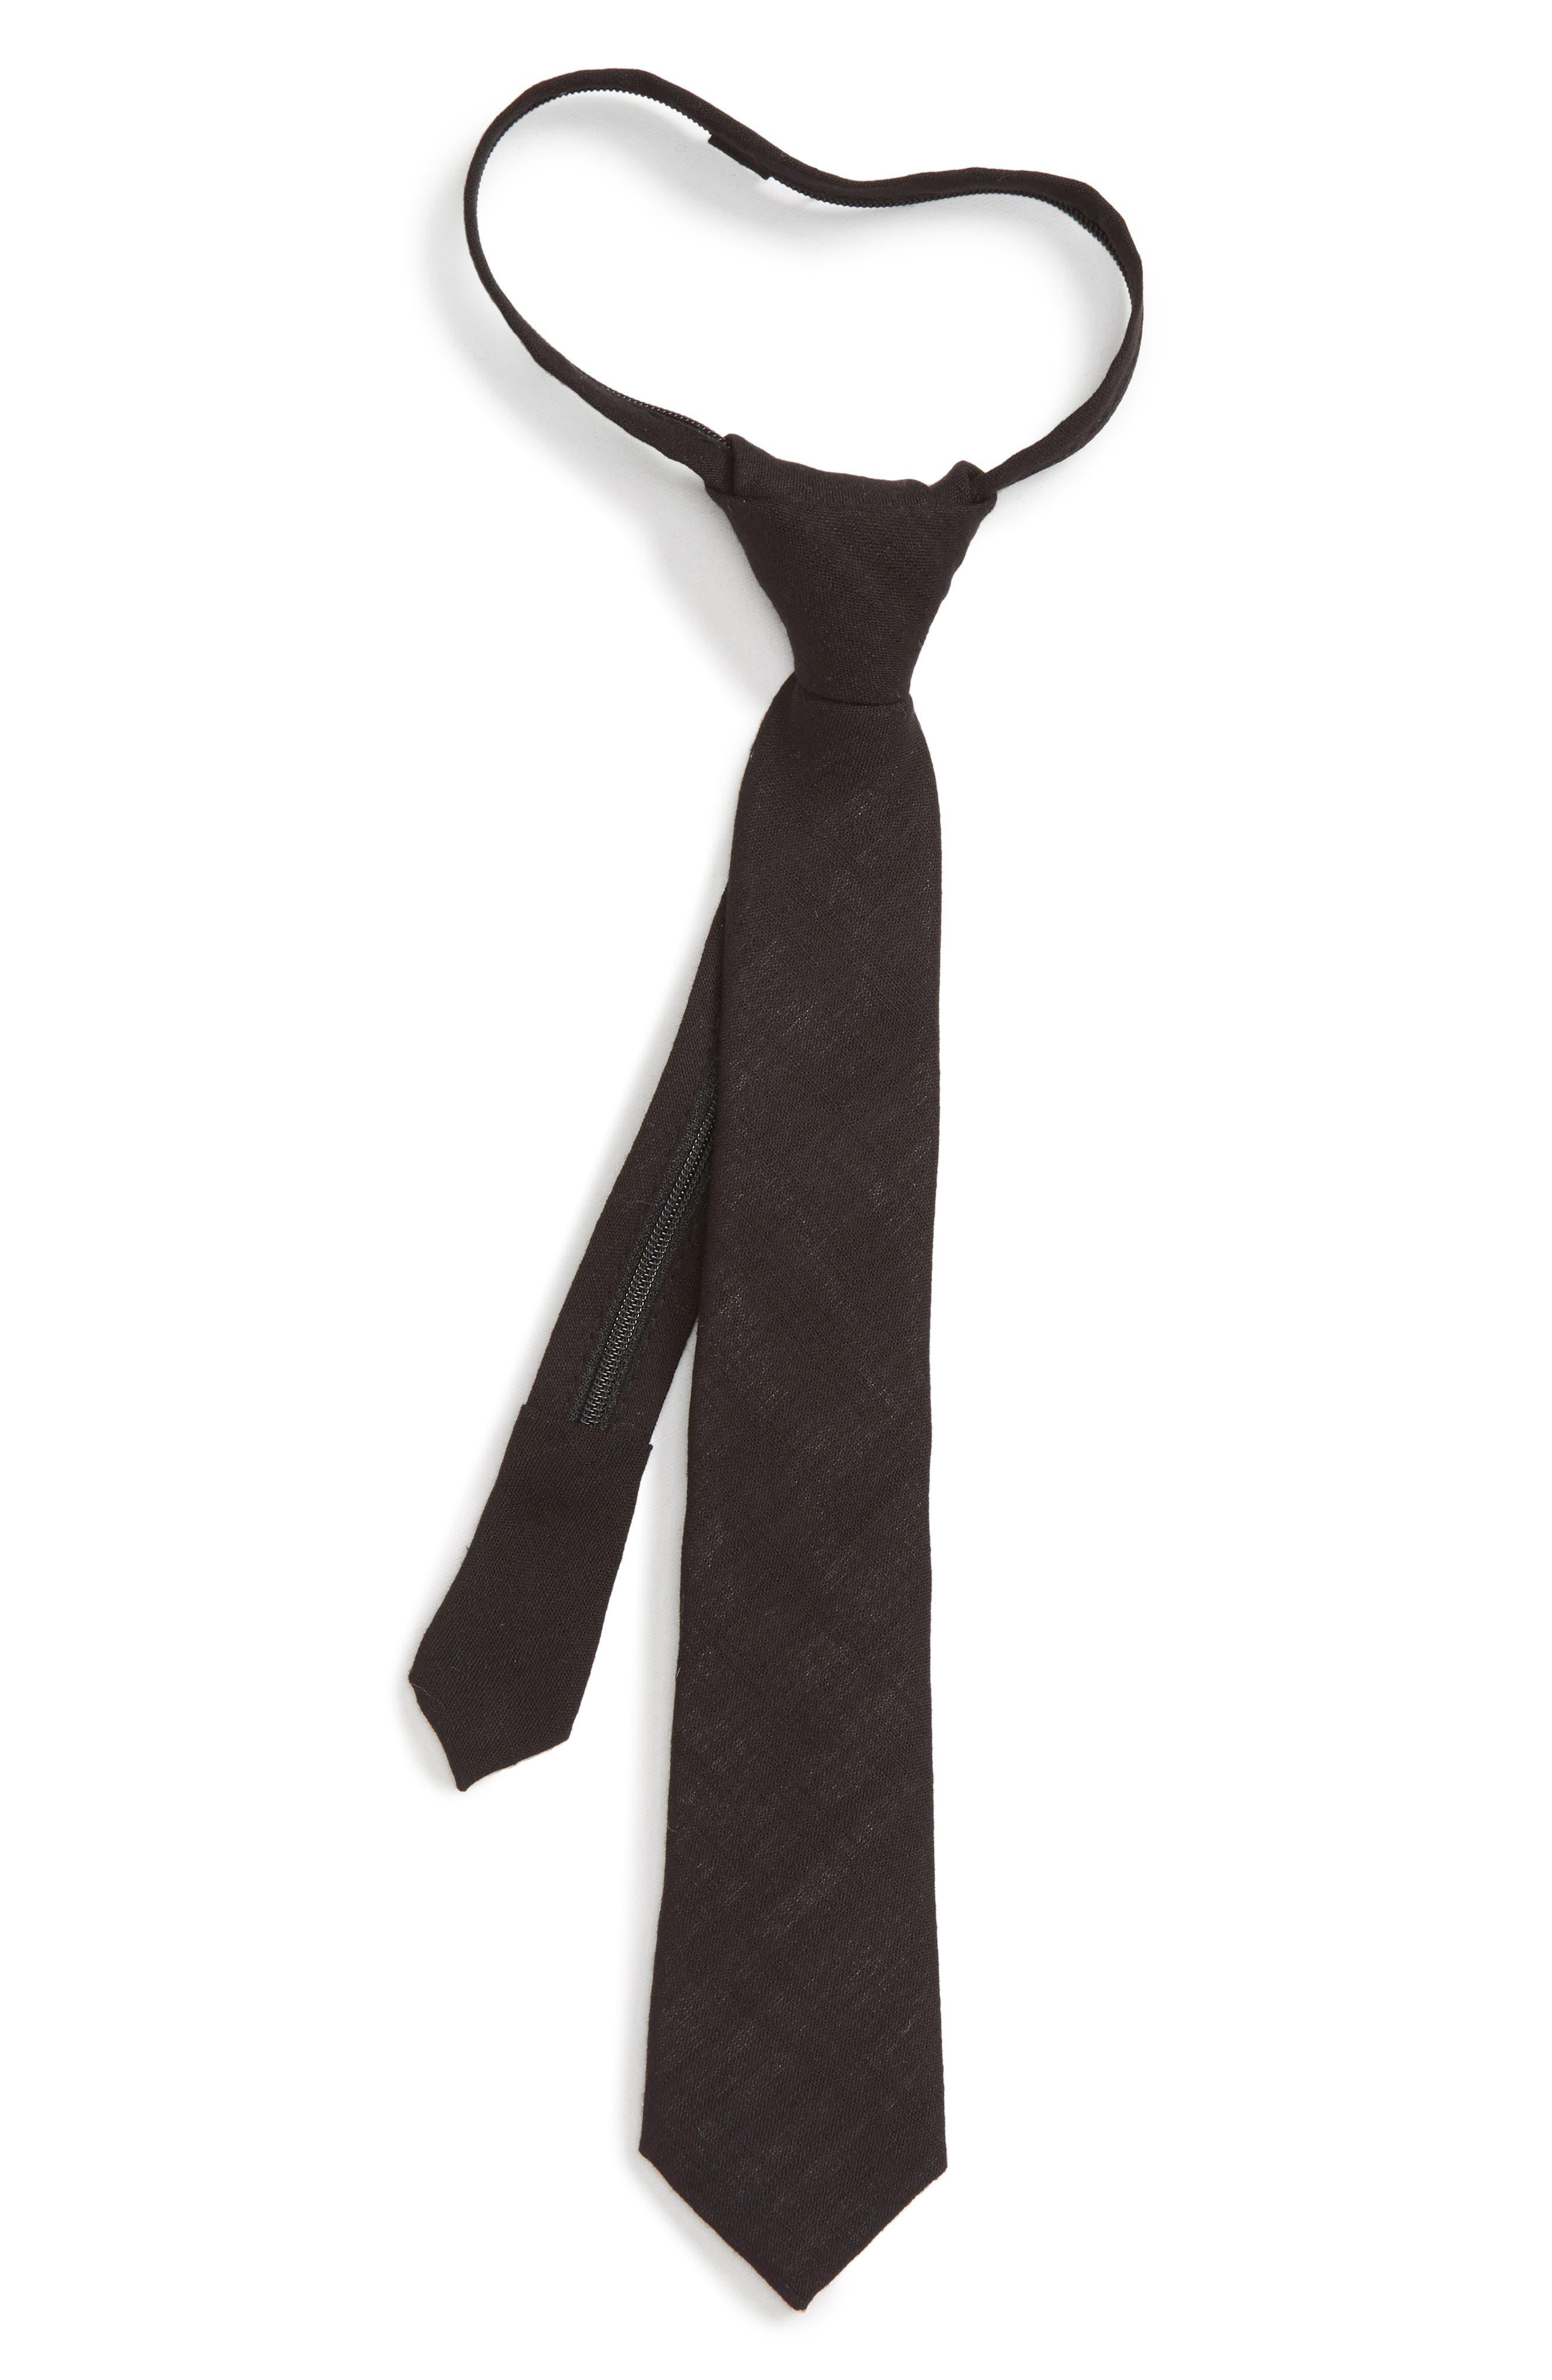 NORDSTROM,                             Solid Zip Tie,                             Main thumbnail 1, color,                             001